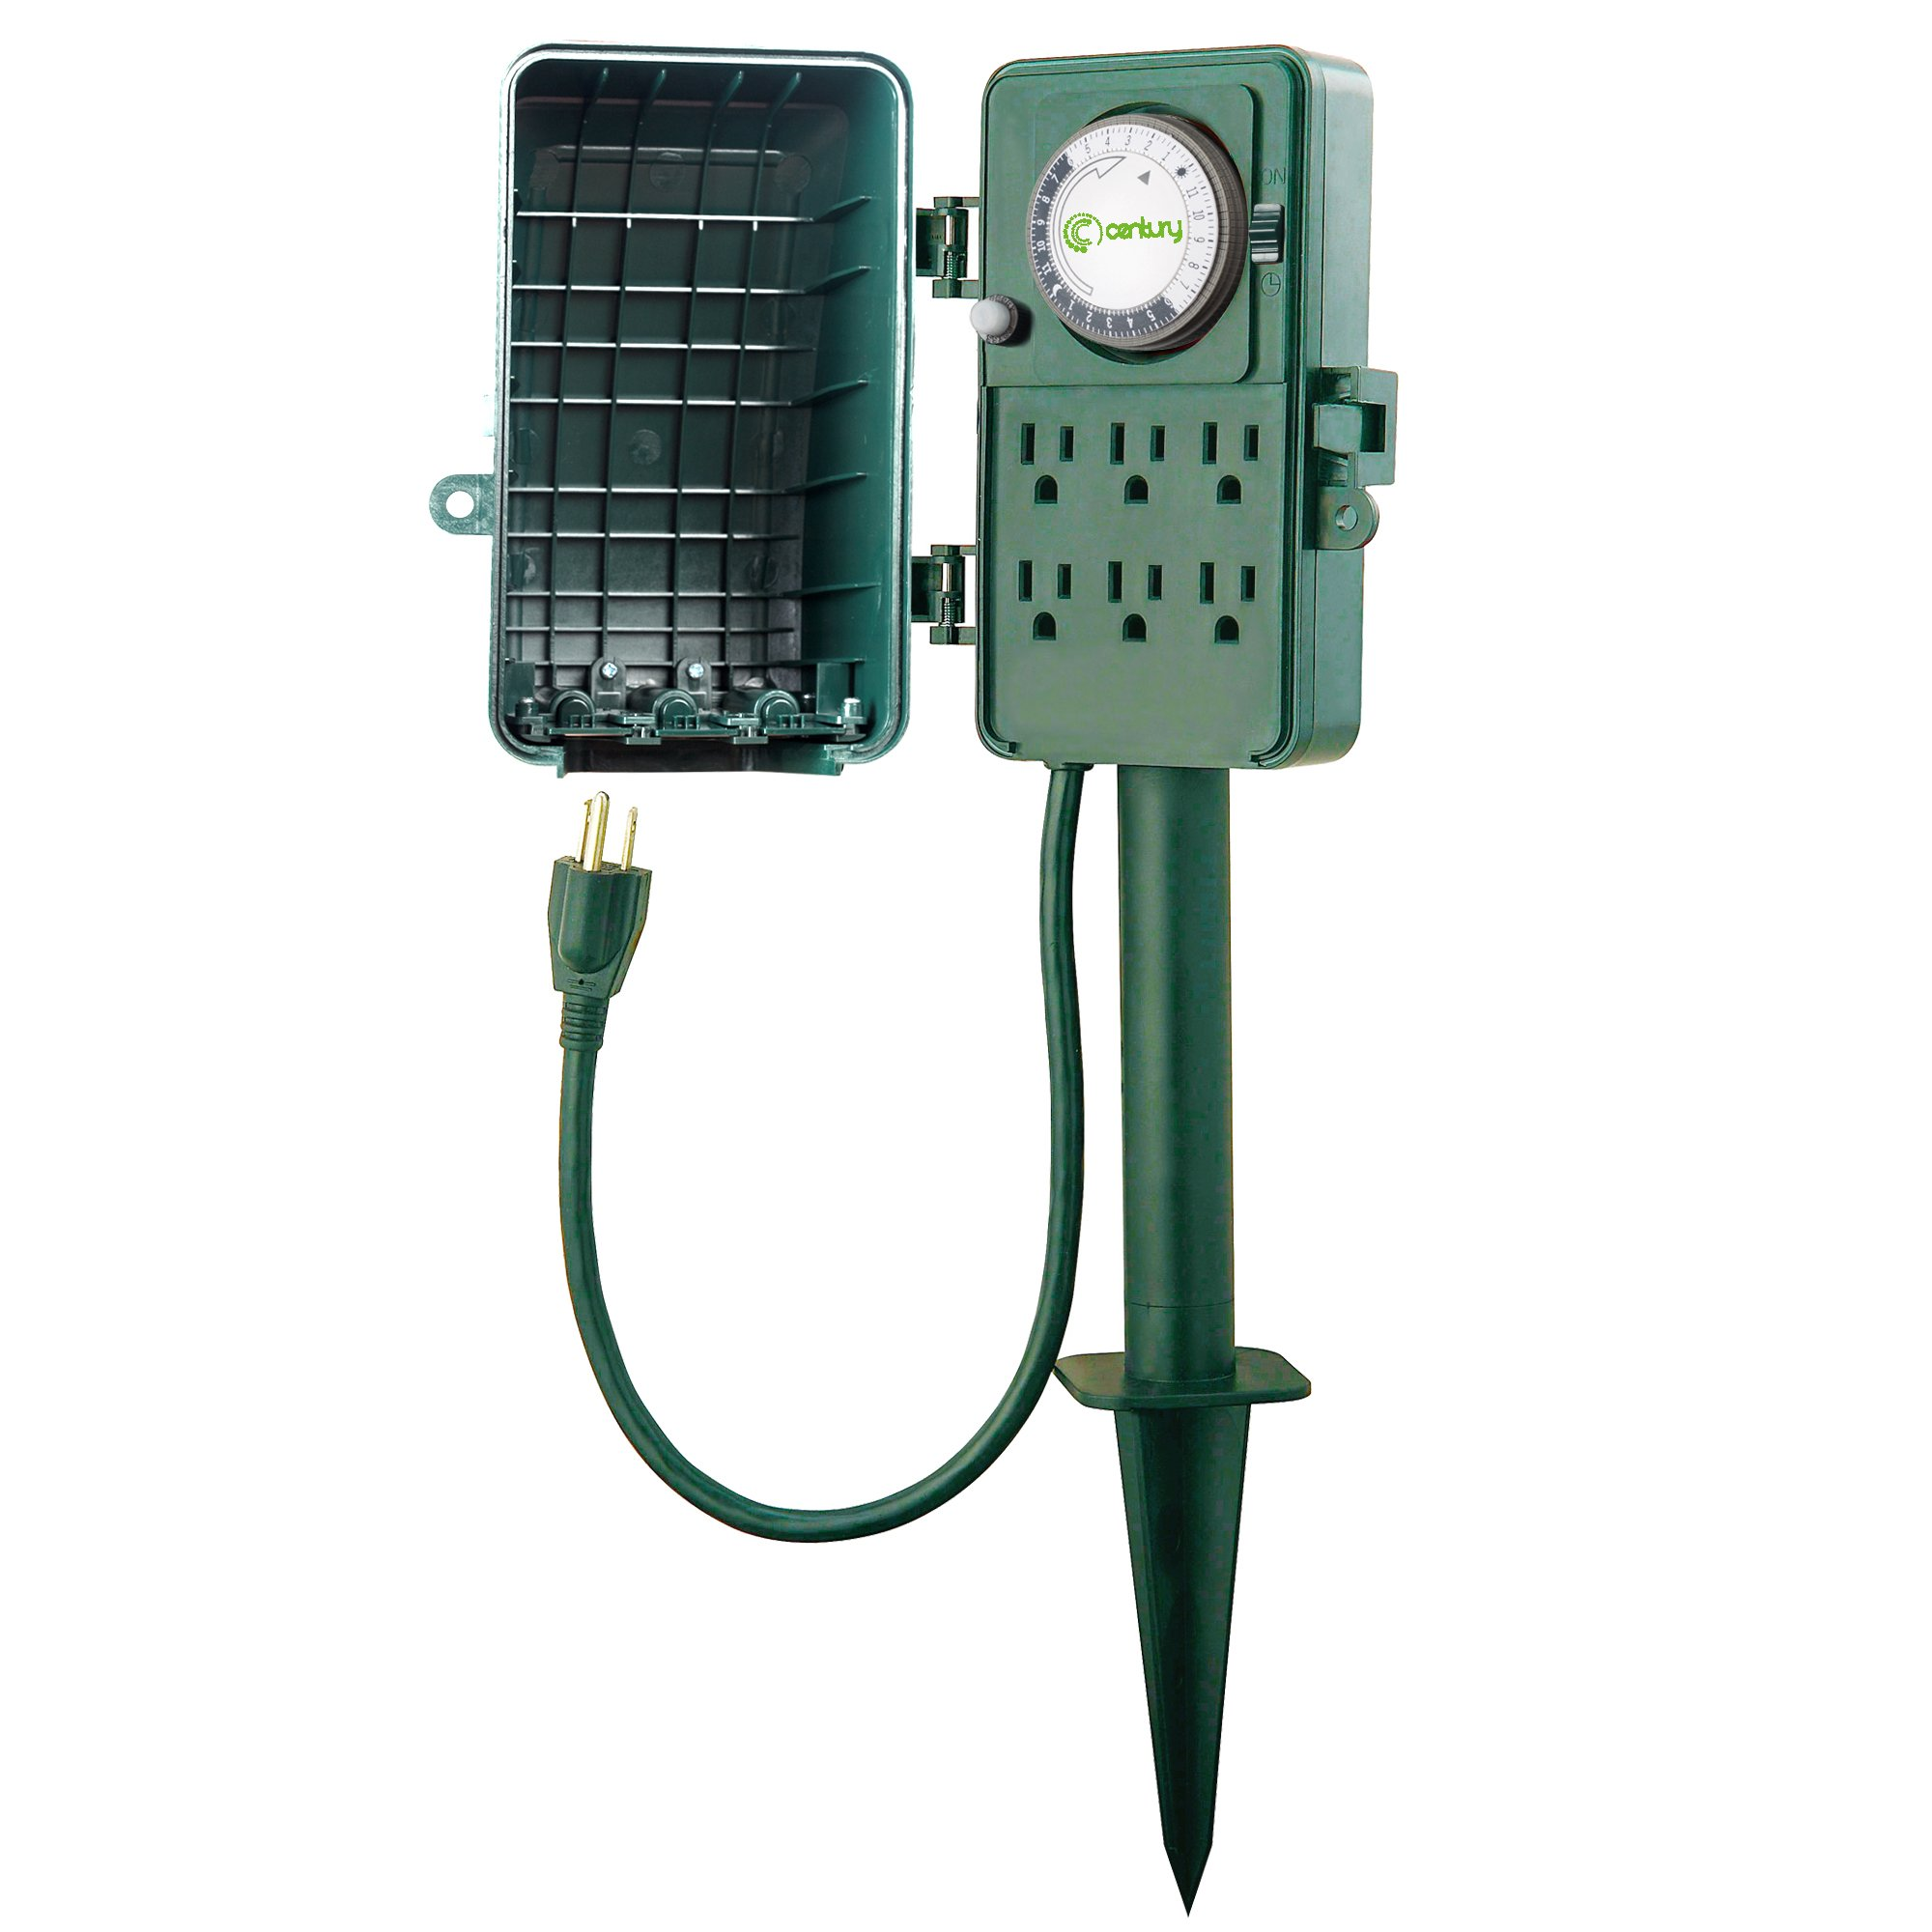 Century 24 Hour Mechanical Outdoor Multi Socket Timer, 6 Outlet Garden Power Stake